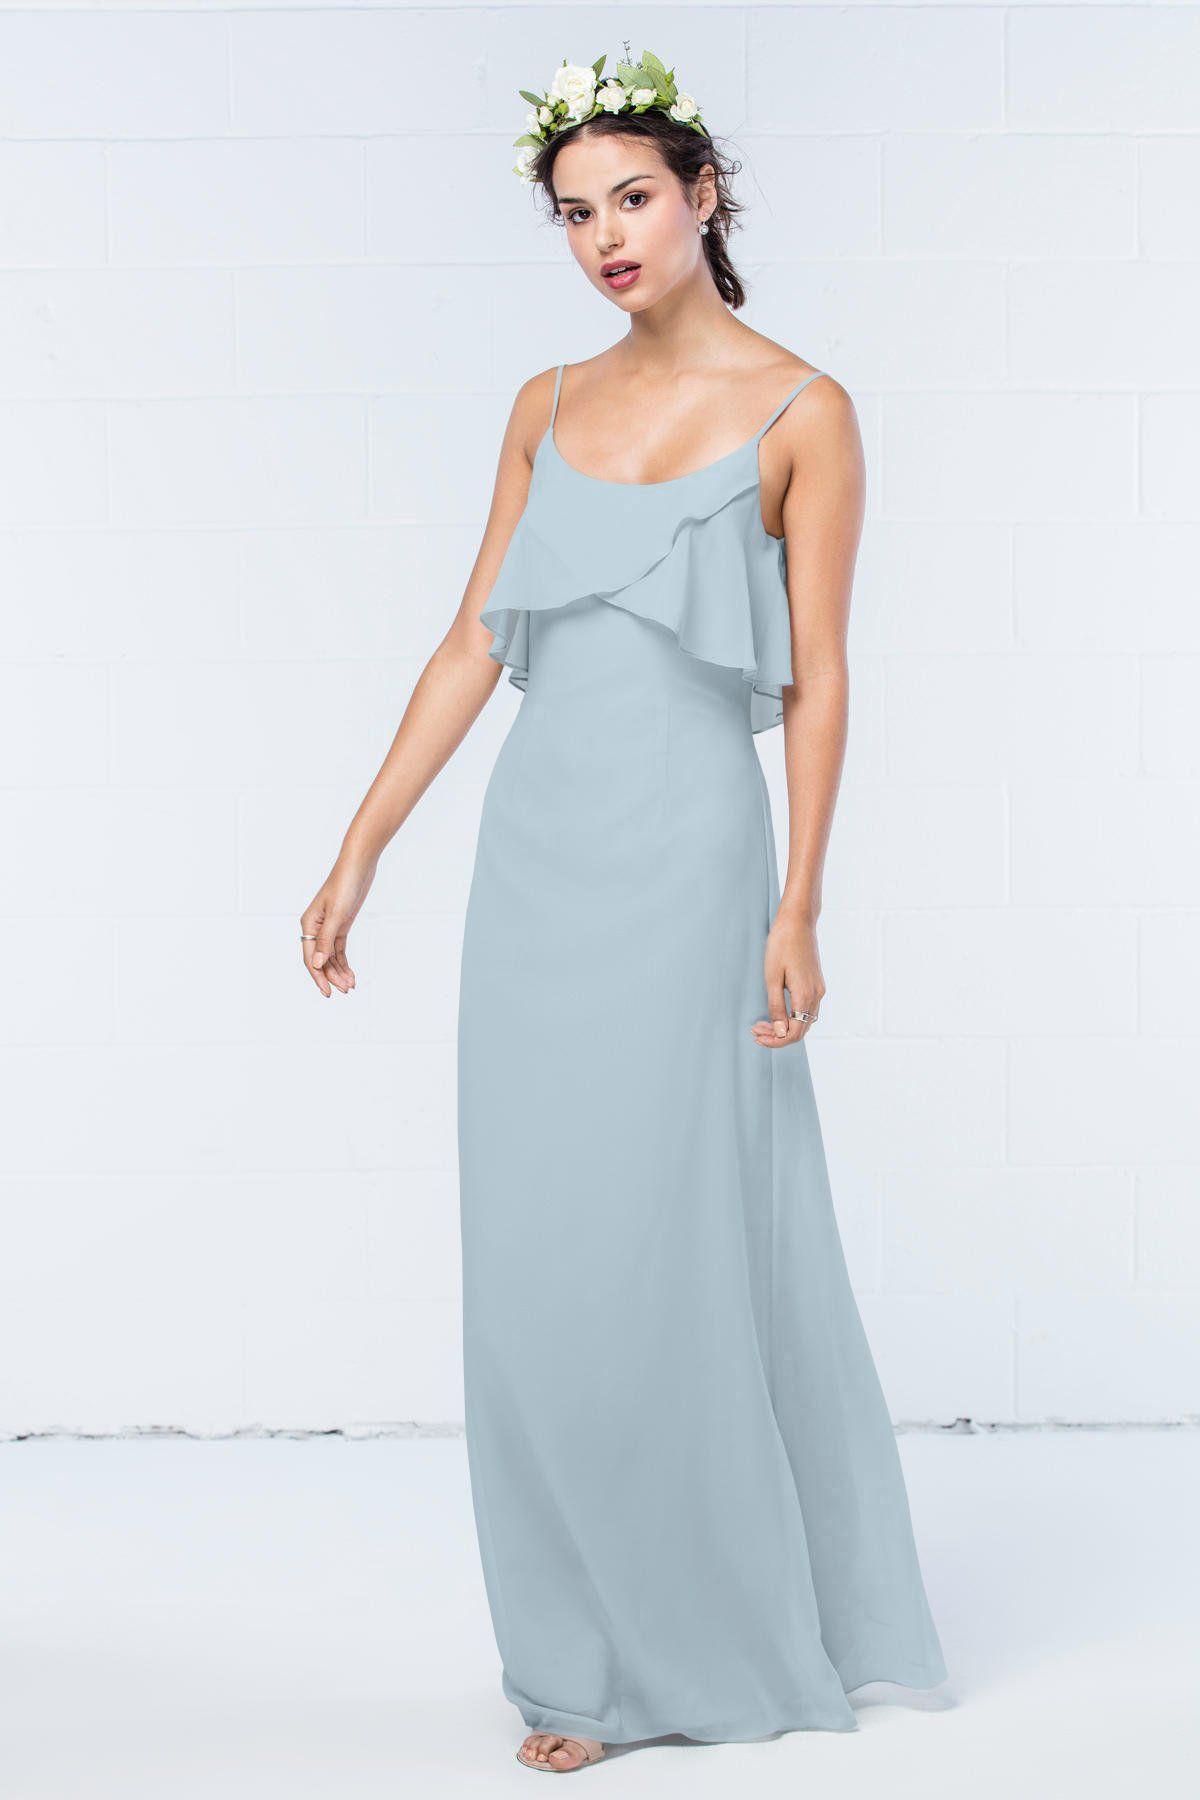 301 | Bridesmaids | Wtoo | Amy wedding | Pinterest | Wedding and ...